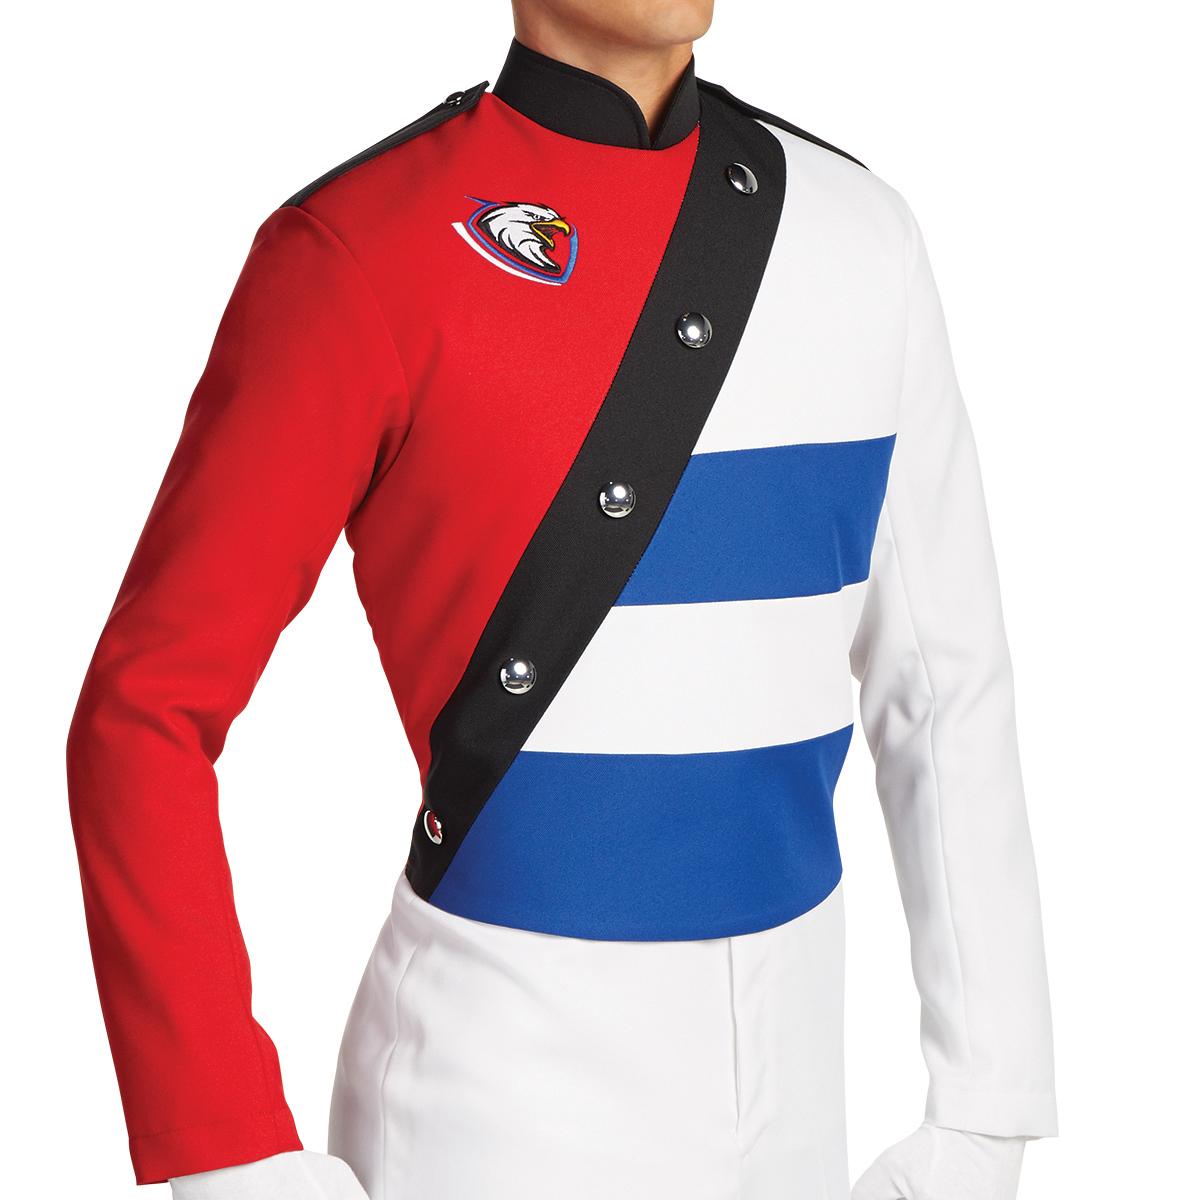 Custom Color Guard Uniforms | Band Shoppe  |Band Shoppe Uniforms